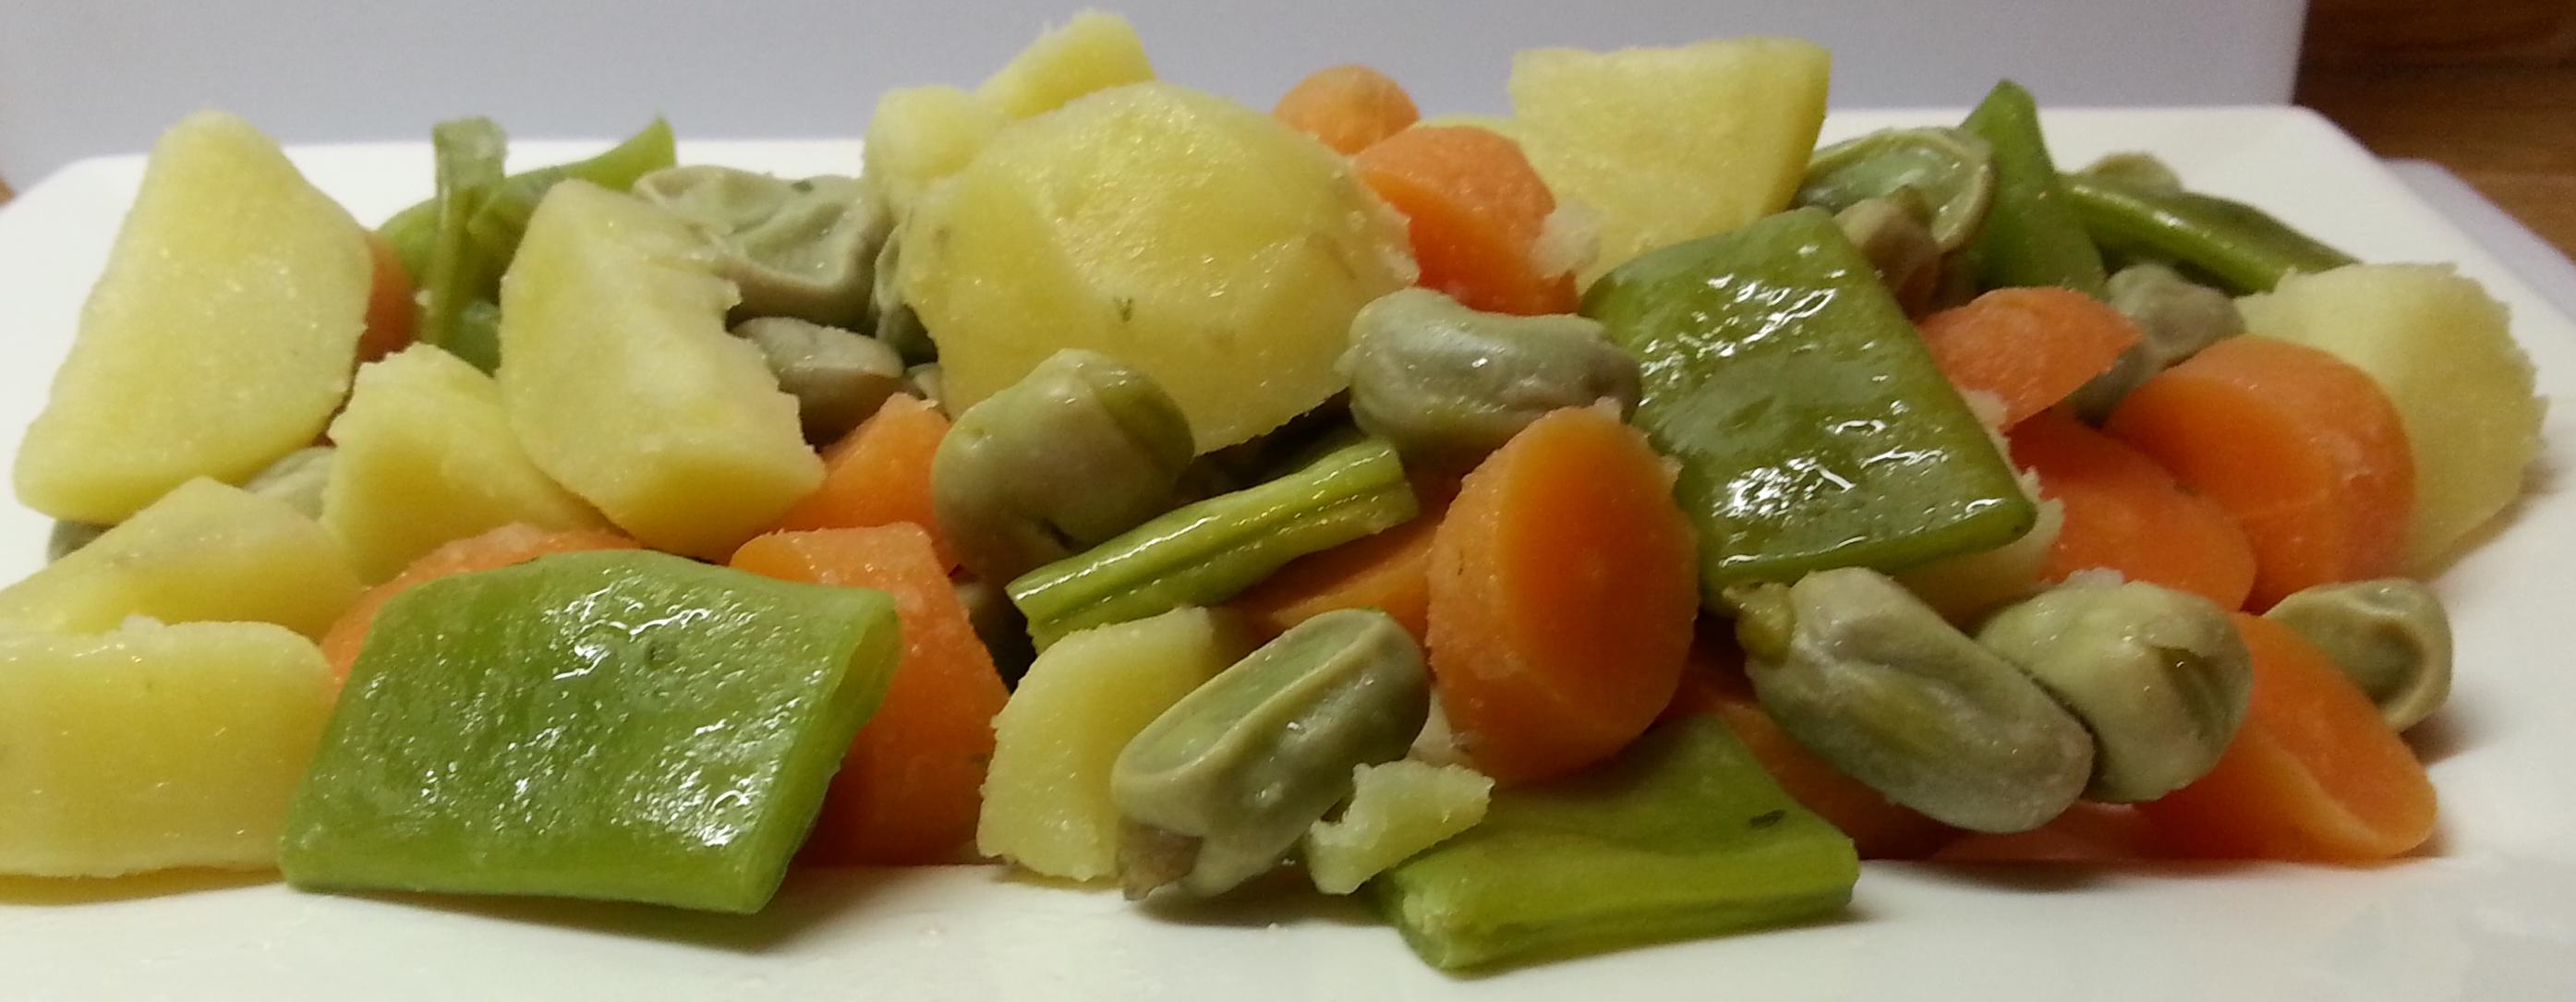 File menestra de wikimedia commons - Menestra de verduras en texturas ...